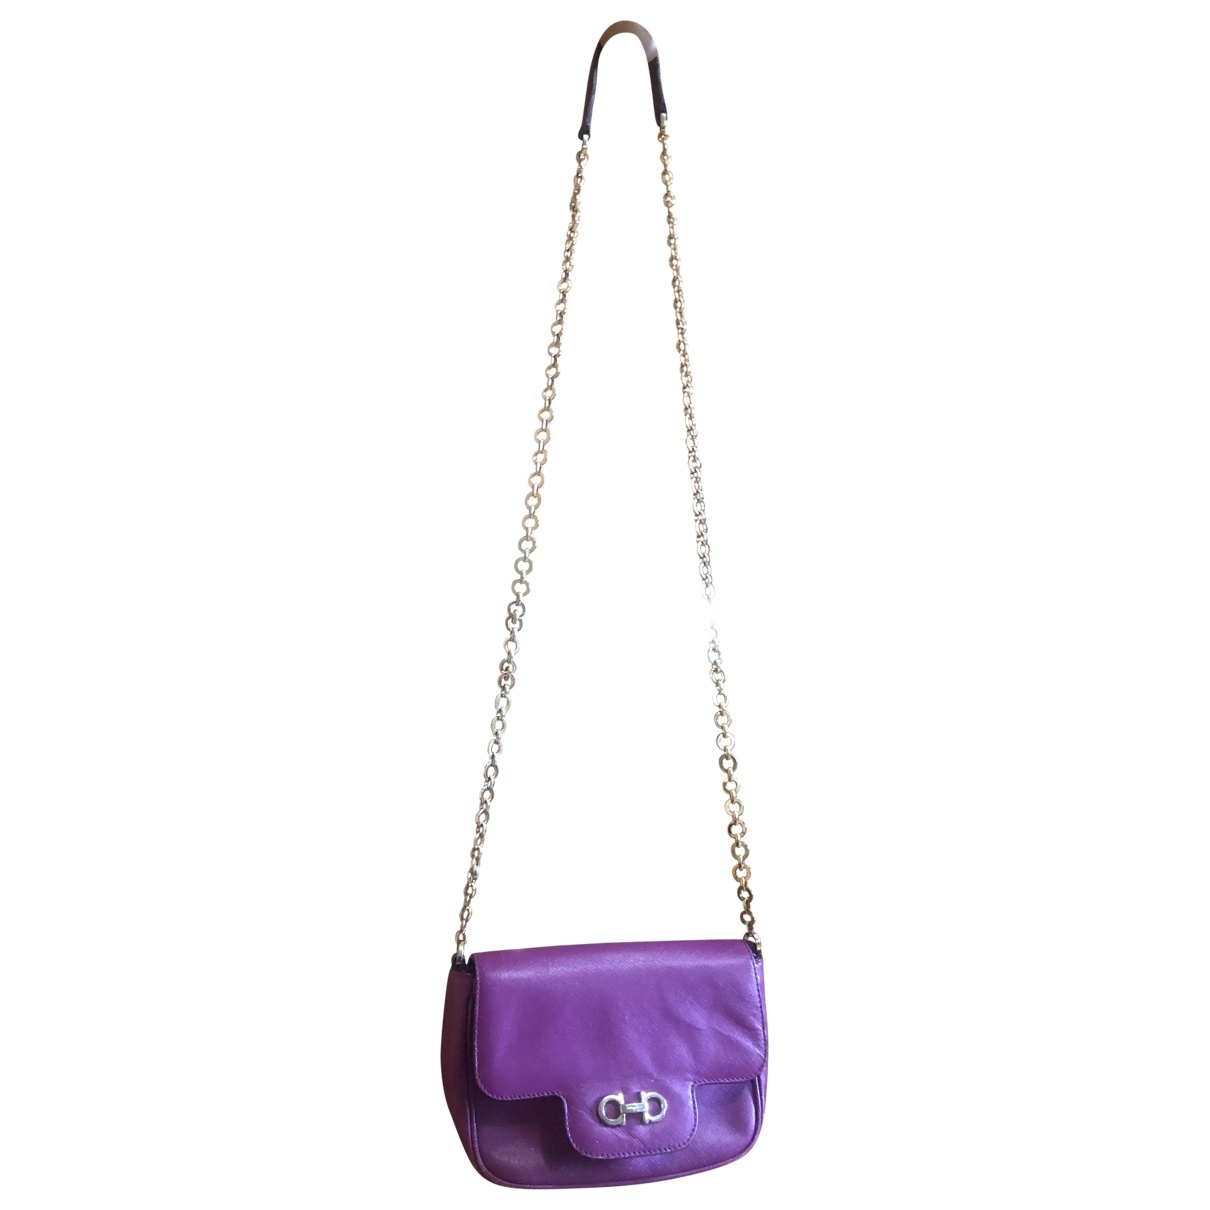 Salvatore Ferragamo \N Purple Leather handbag for Women \N